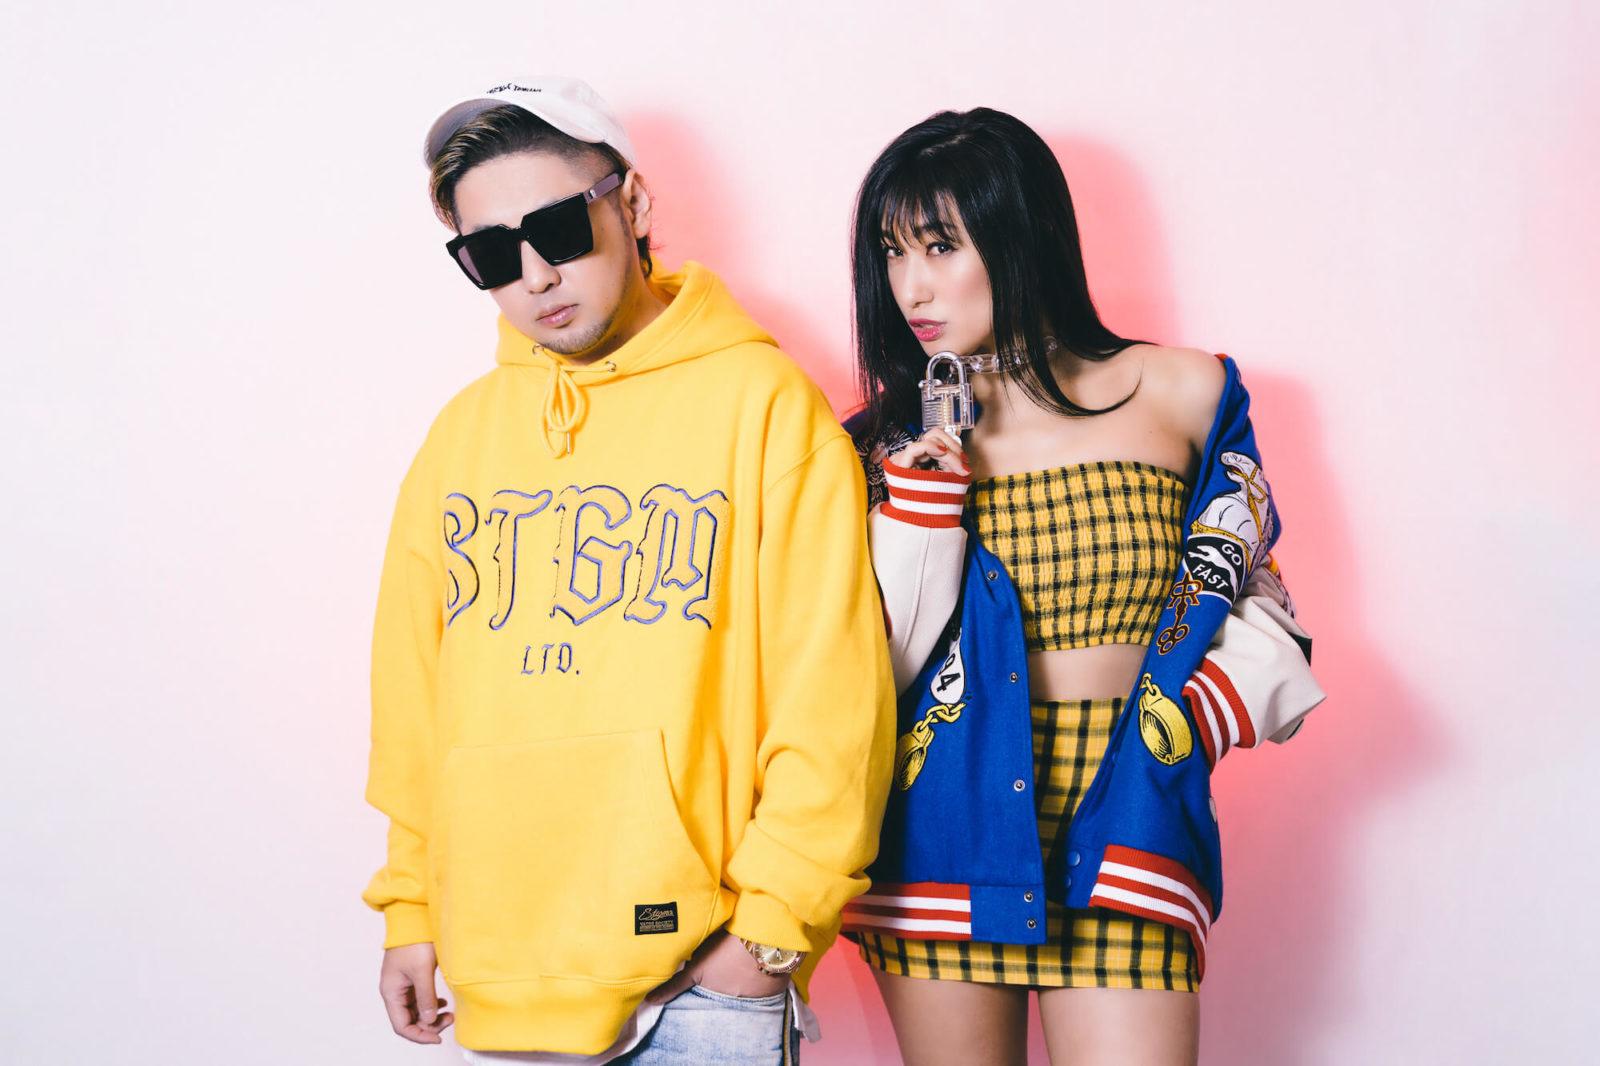 MAY'Sの新曲が2曲連続 Digital Singleリリース&配信ライブ「MAY'S LIVE 2020 幻夏夢物語」開催決定サムネイル画像